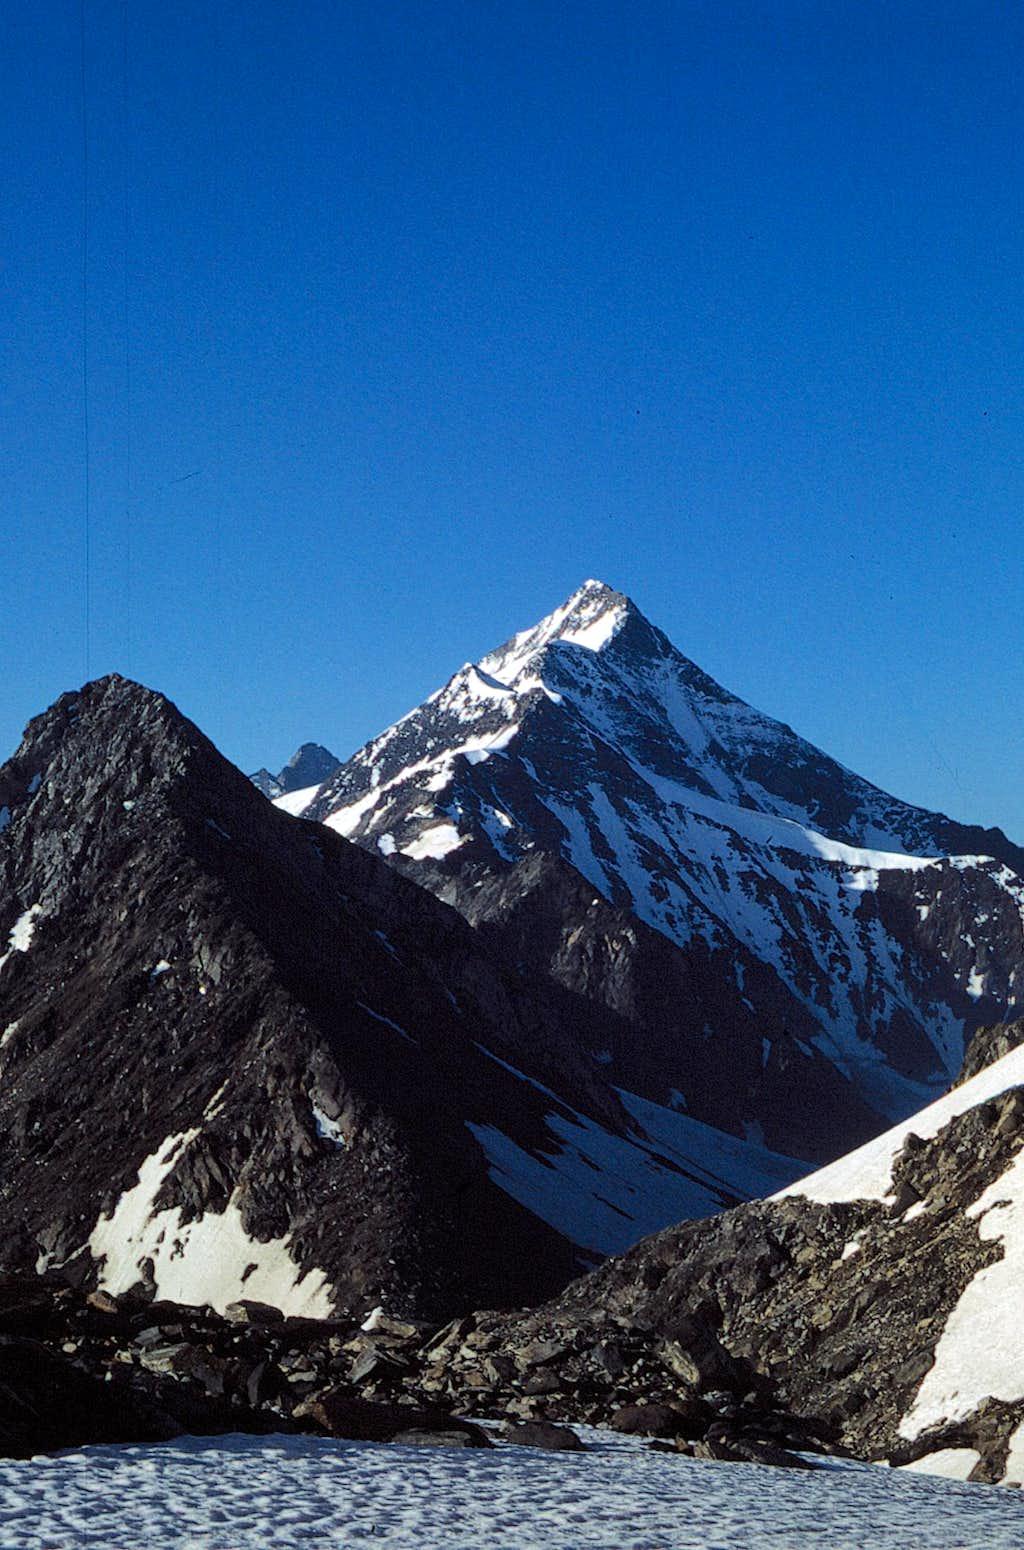 The NE ridge and the summit...